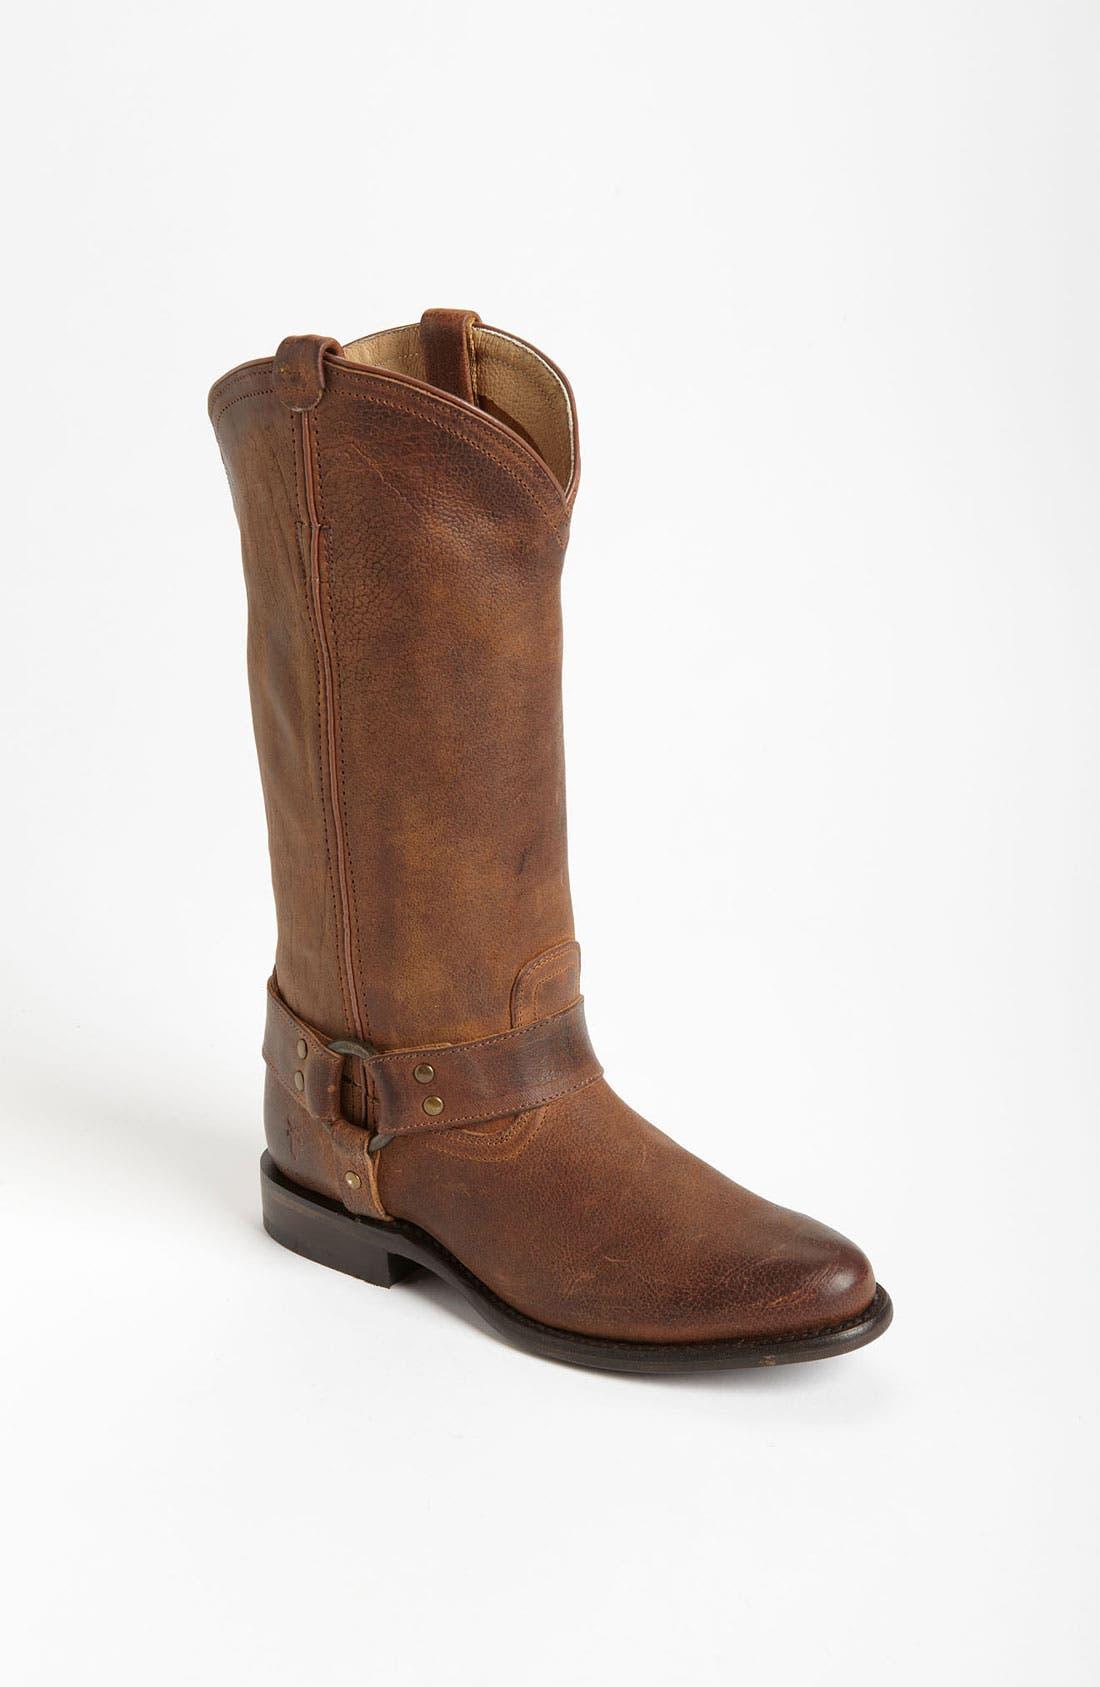 Alternate Image 1 Selected - Frye 'Wyatt' Harness Boot